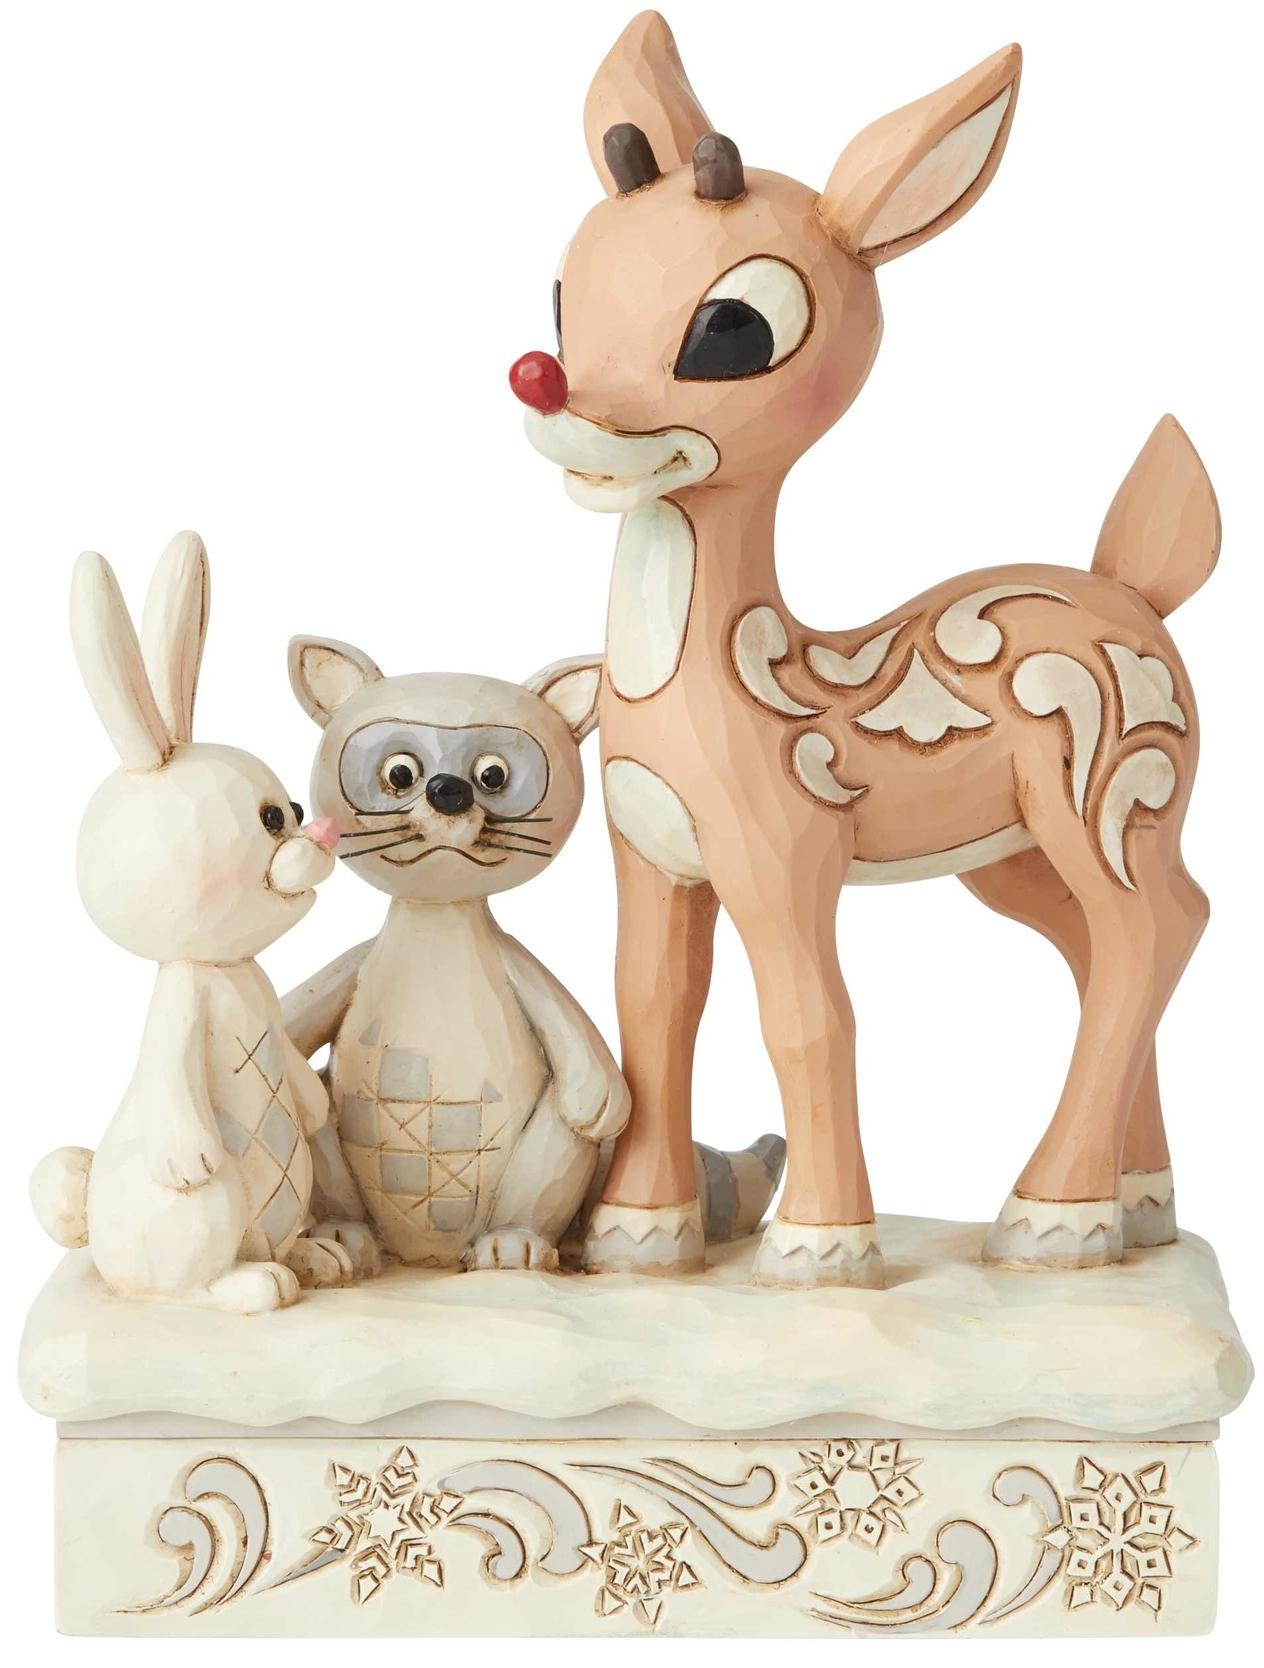 Jim Shore Rudolph Reindeer 6004147 Woodland Rudolph